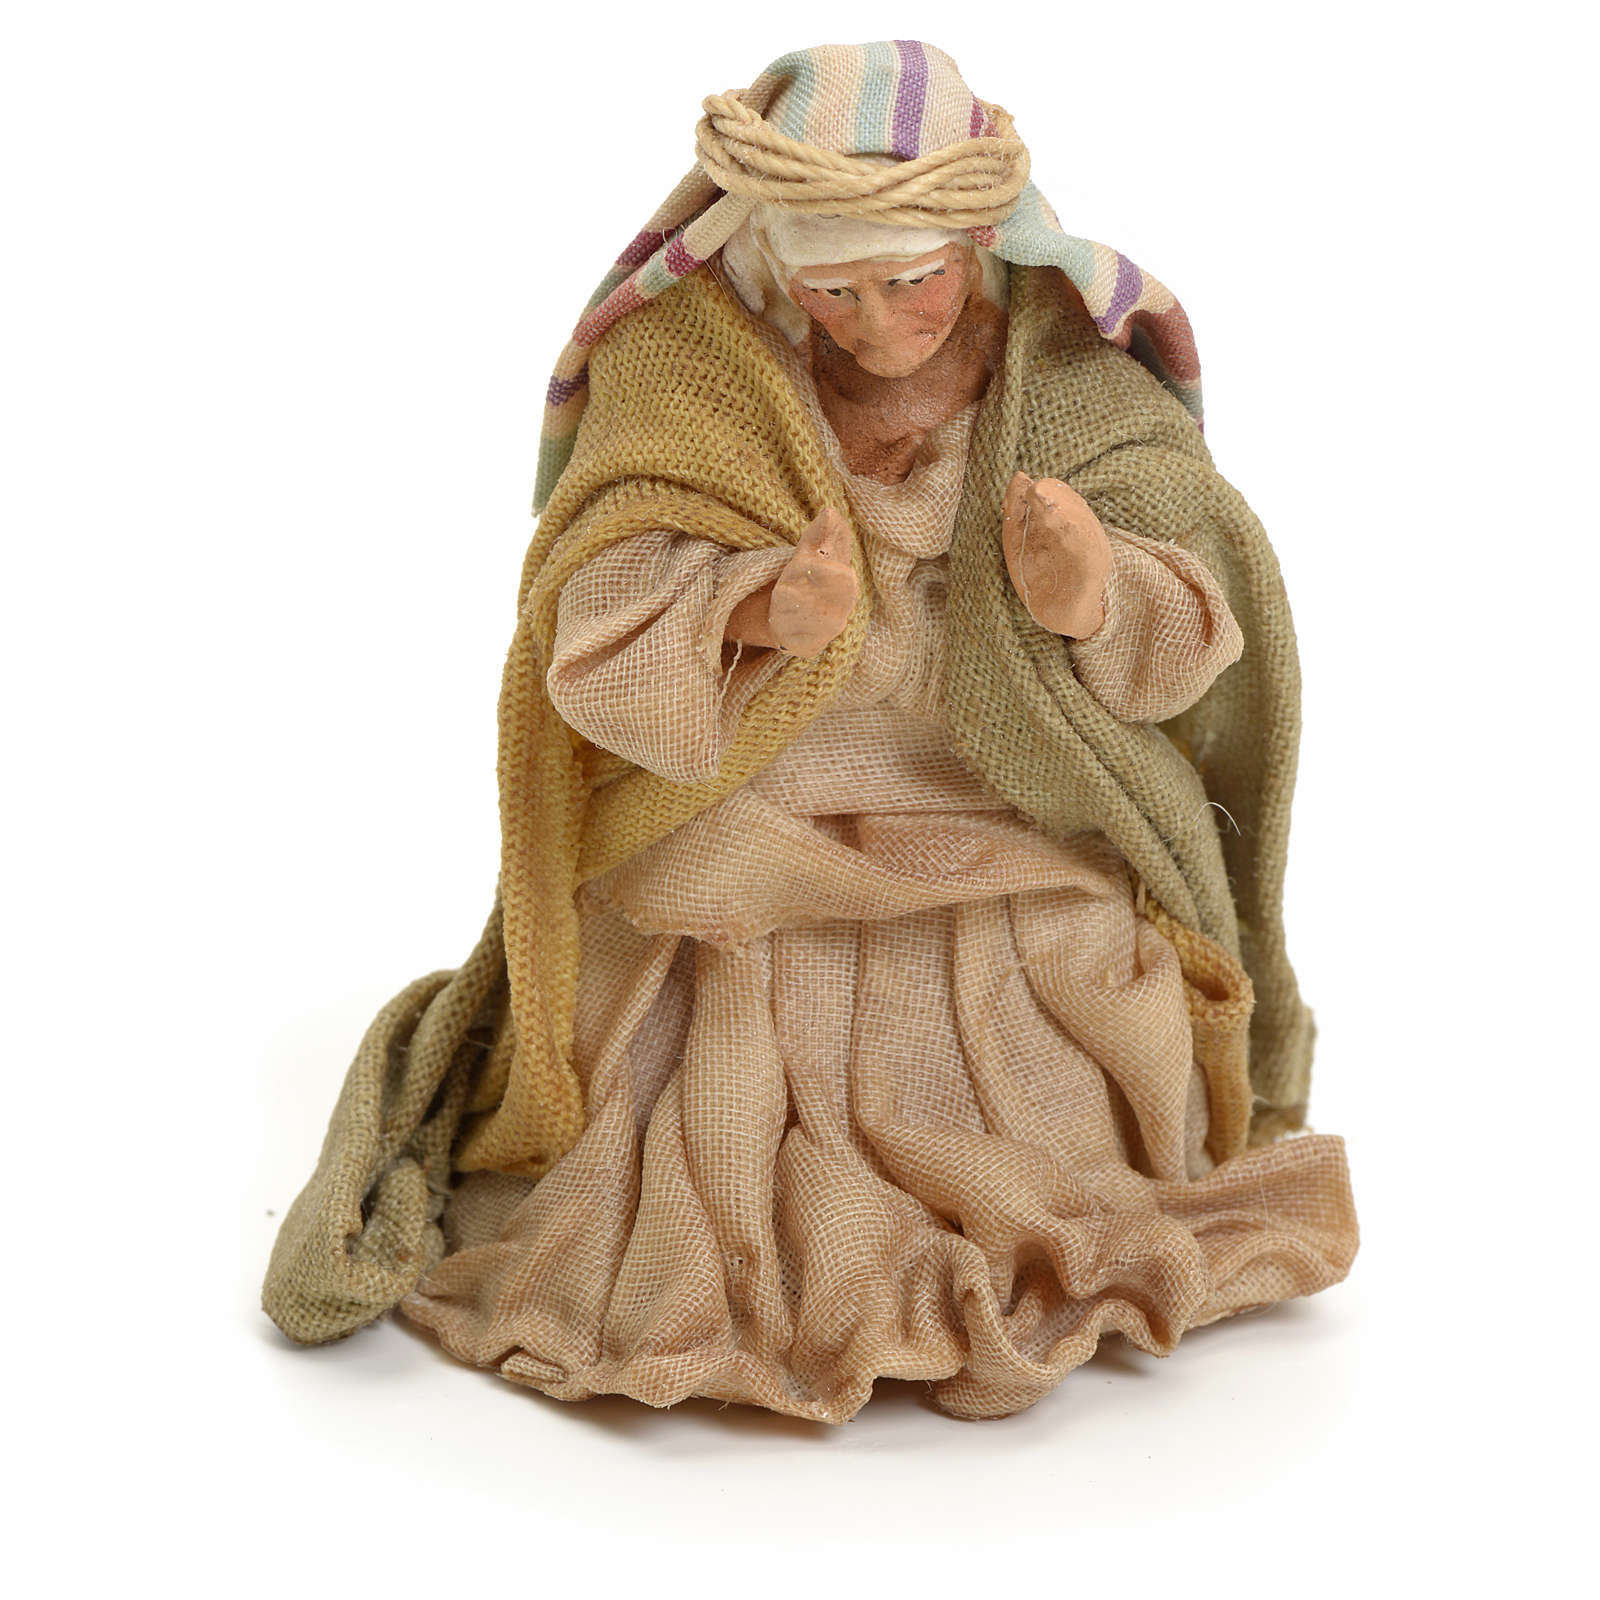 Neapolitan Nativity figurine, kneeling woman praying, 8 cm 4